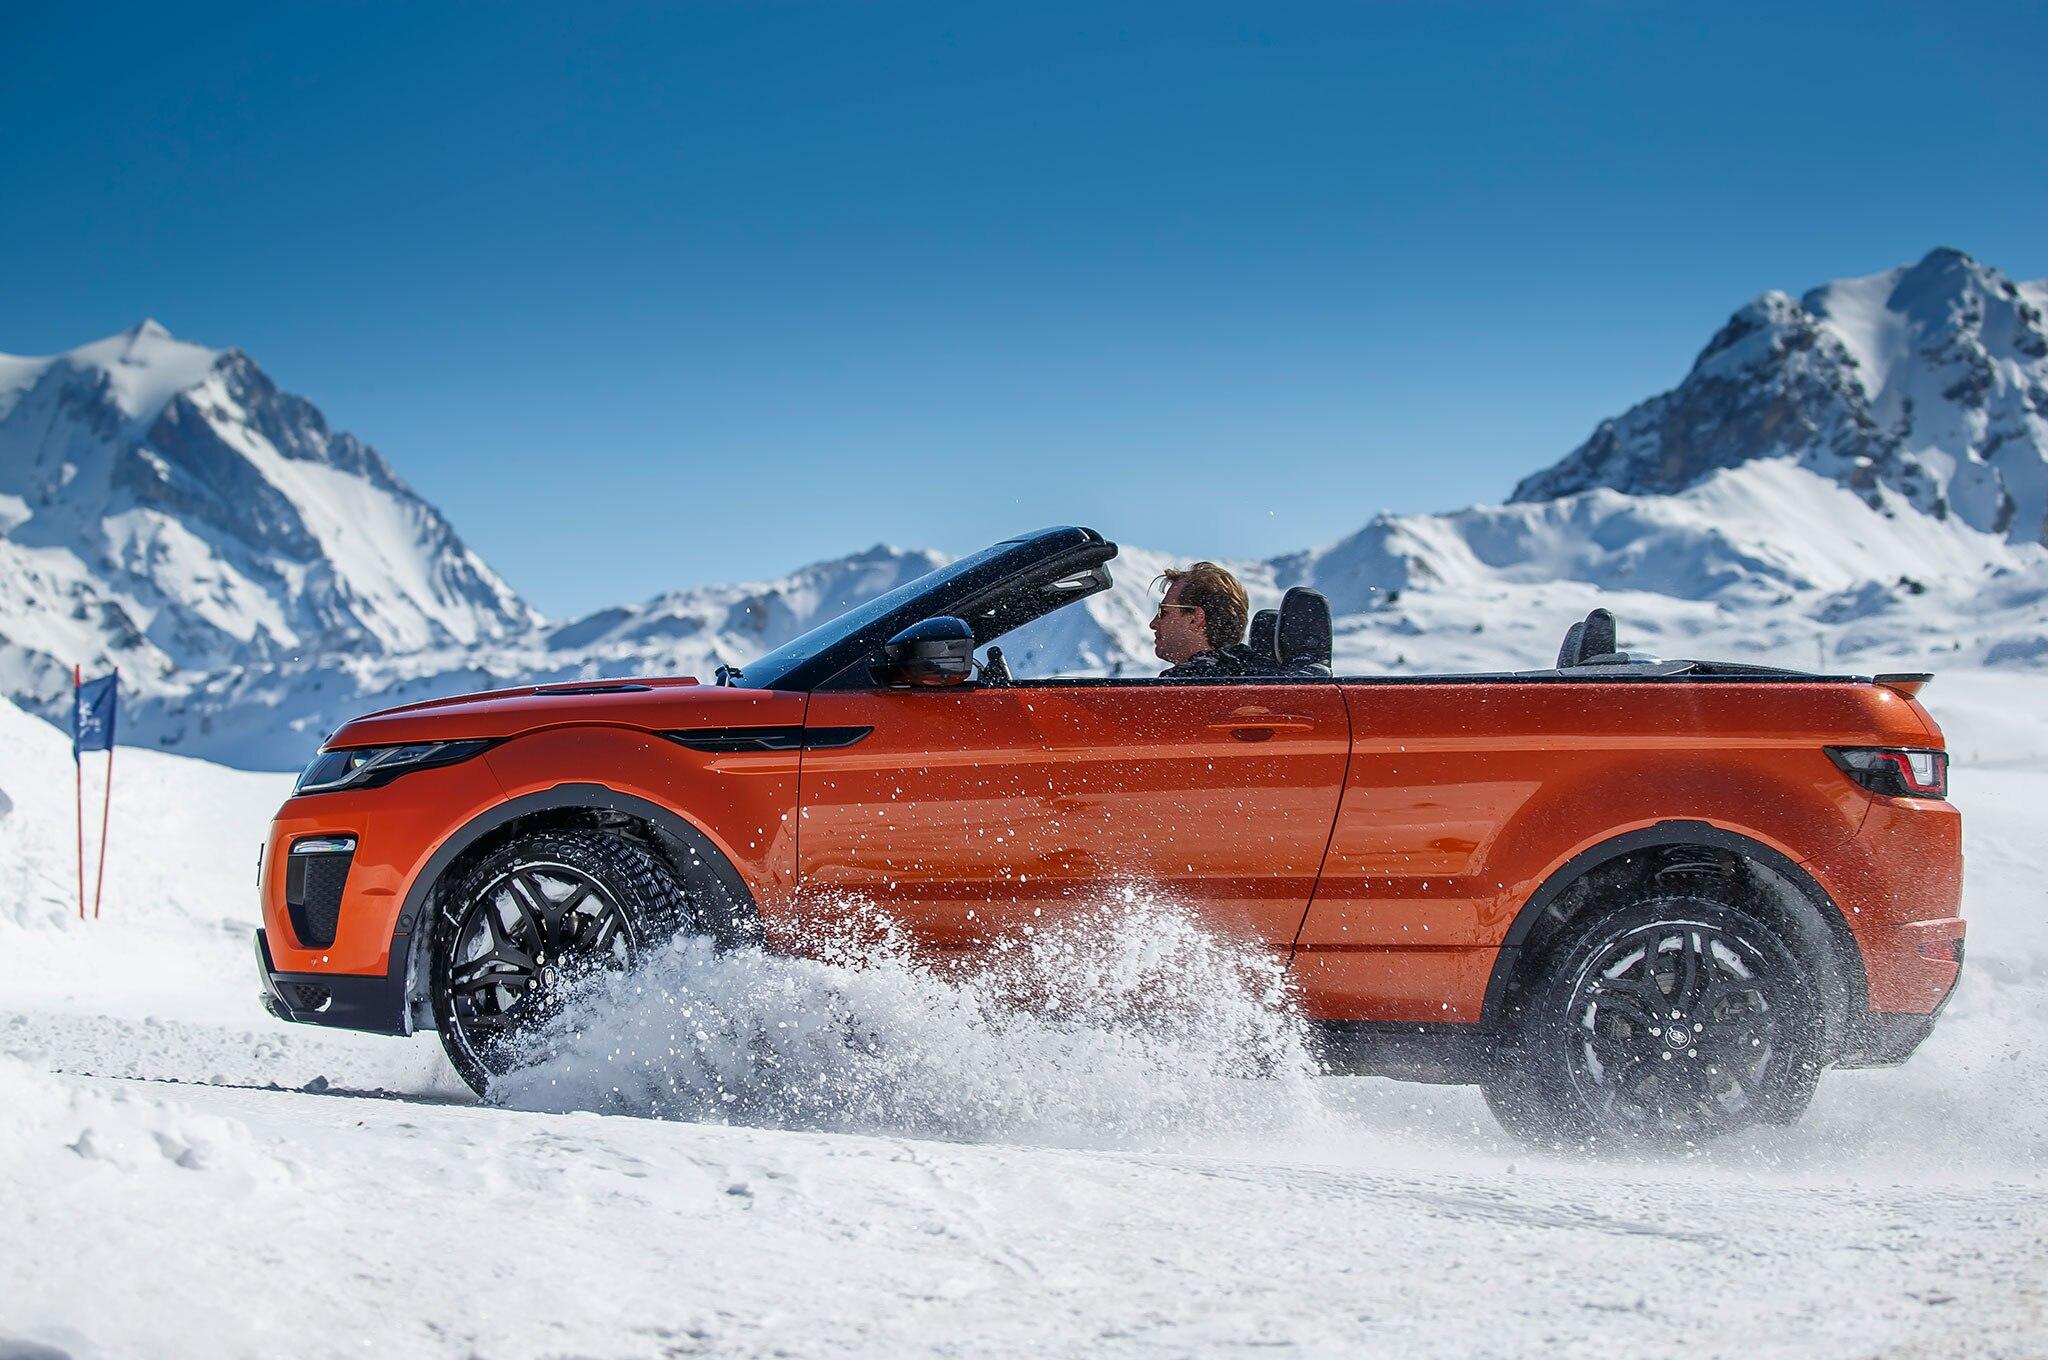 http://st.automobilemag.com/uploads/sites/11/2016/03/2017-Range-Rover-Evoque-Convertible-side-profile-on-snow-03.jpg